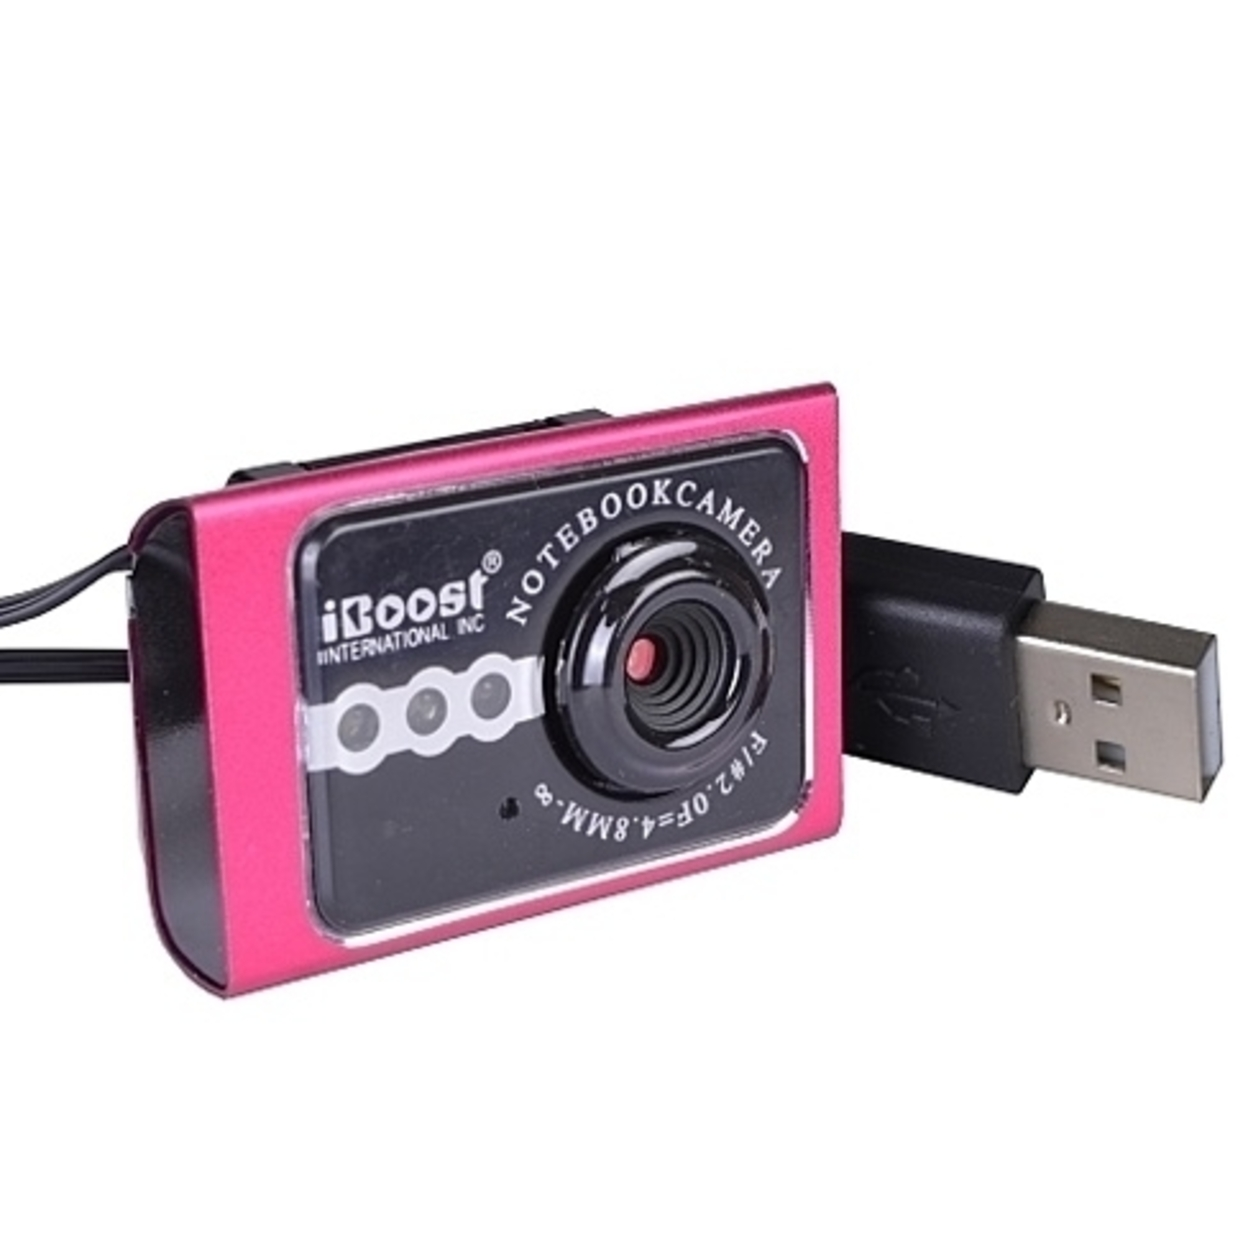 LiveCam 2.0Mp USB 2.0 Webcam w/Built-in Microphone - Pink 57910a335078a82b1579c4a2